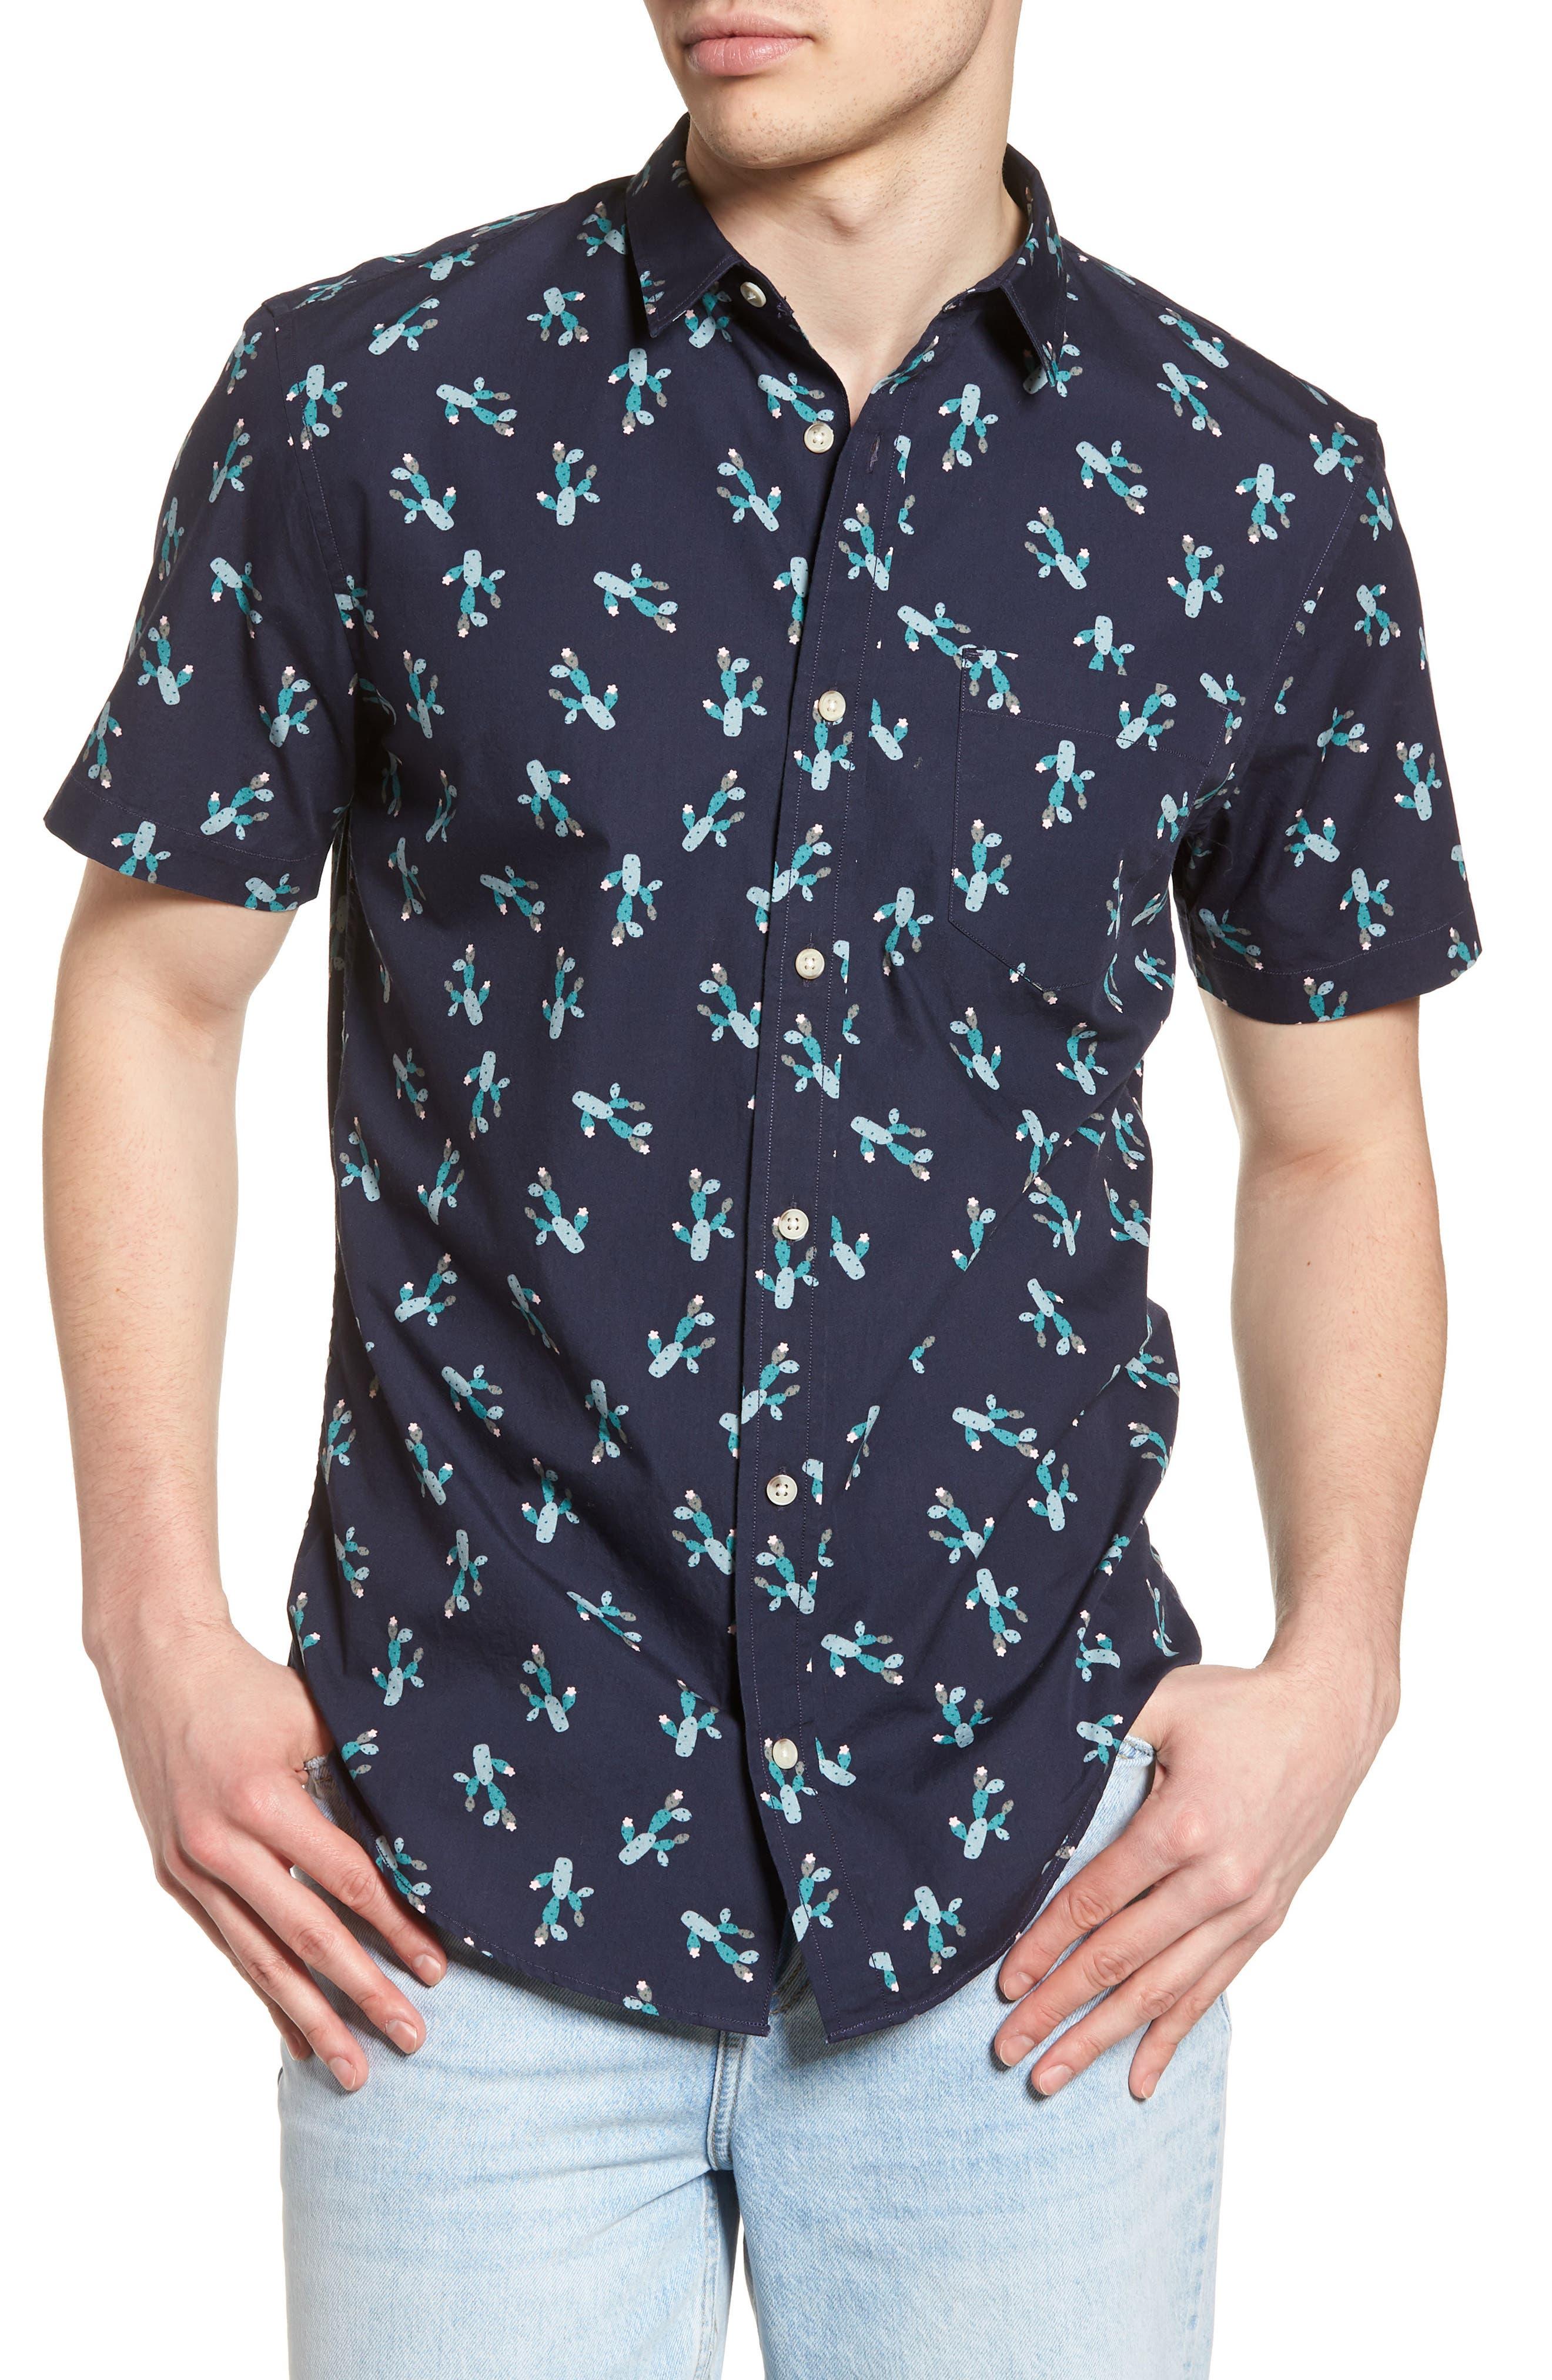 THE RAIL Print Woven Shirt, Main, color, 410